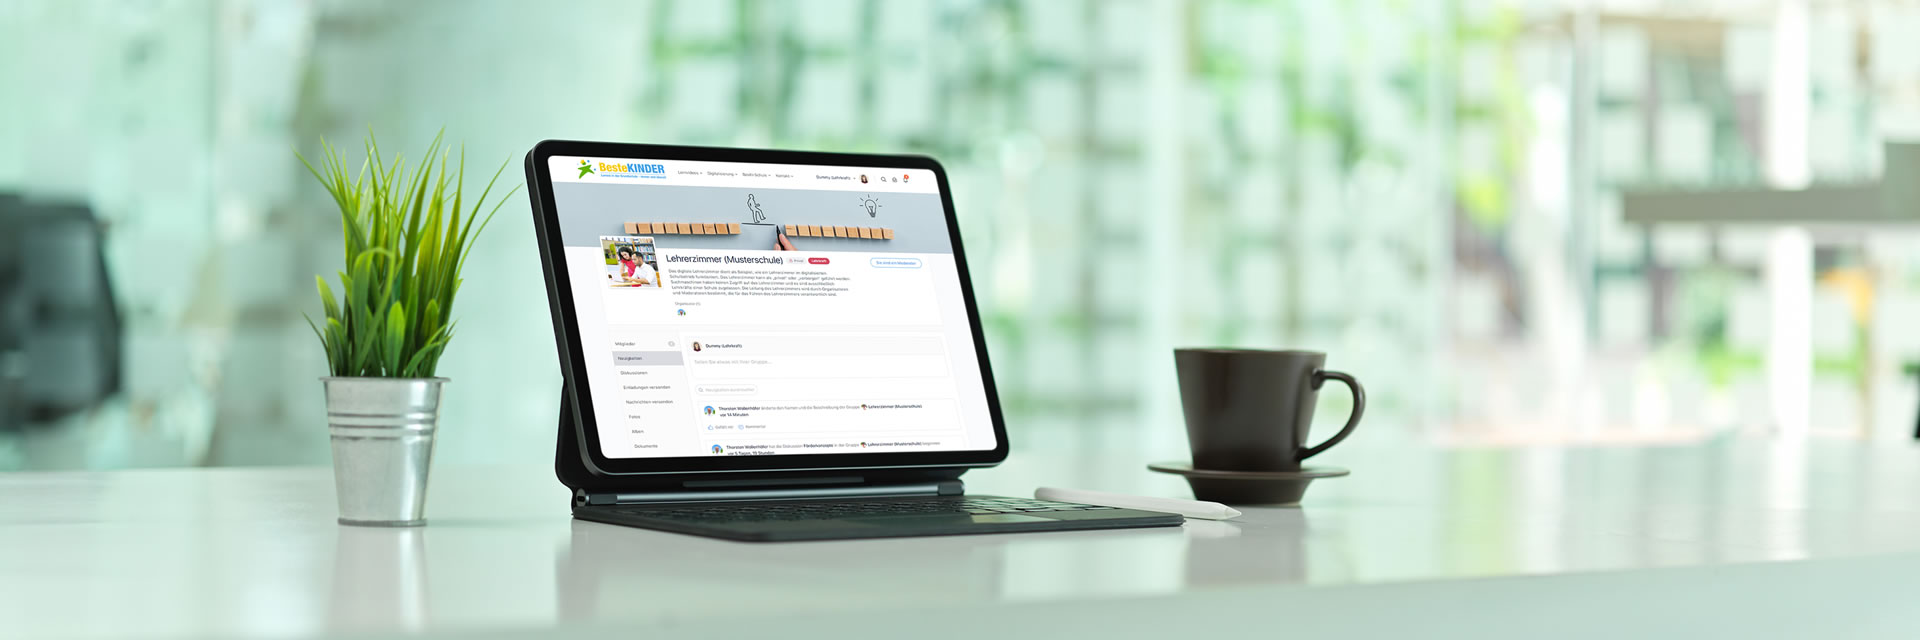 Digitales Lehrerzimmer